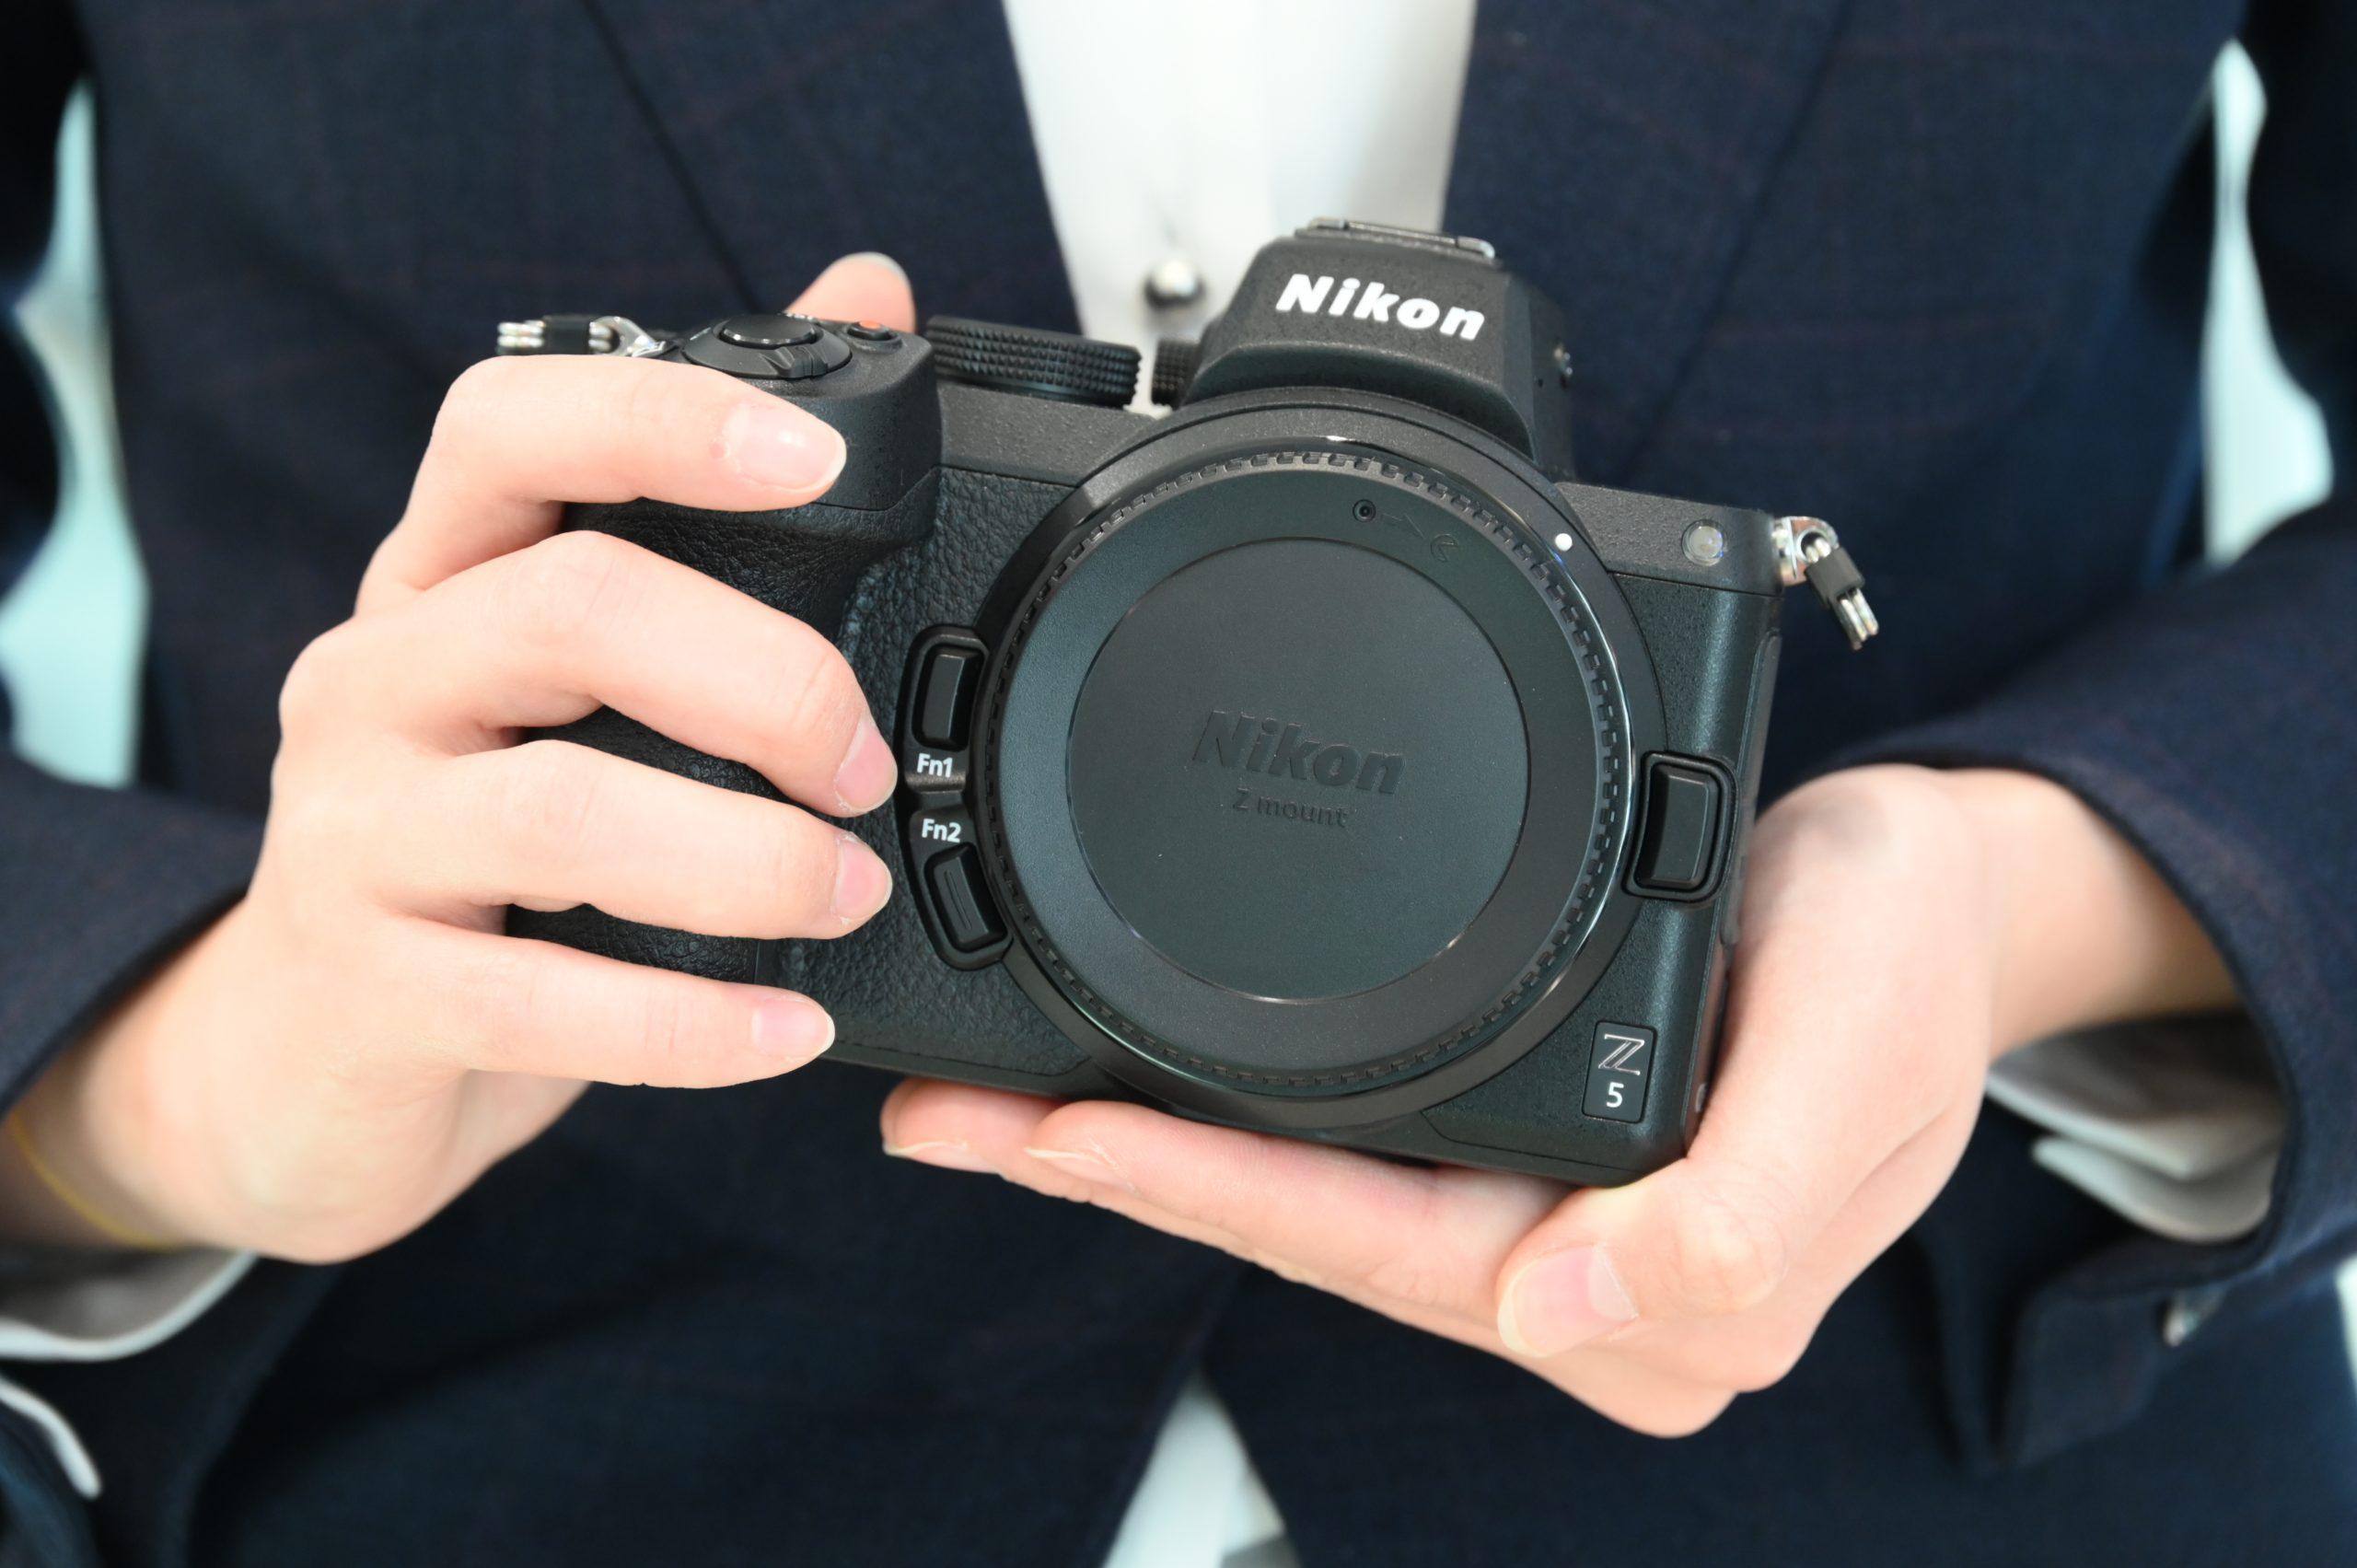 【Nikon】今あえてNikon「Z5」を選択する理由